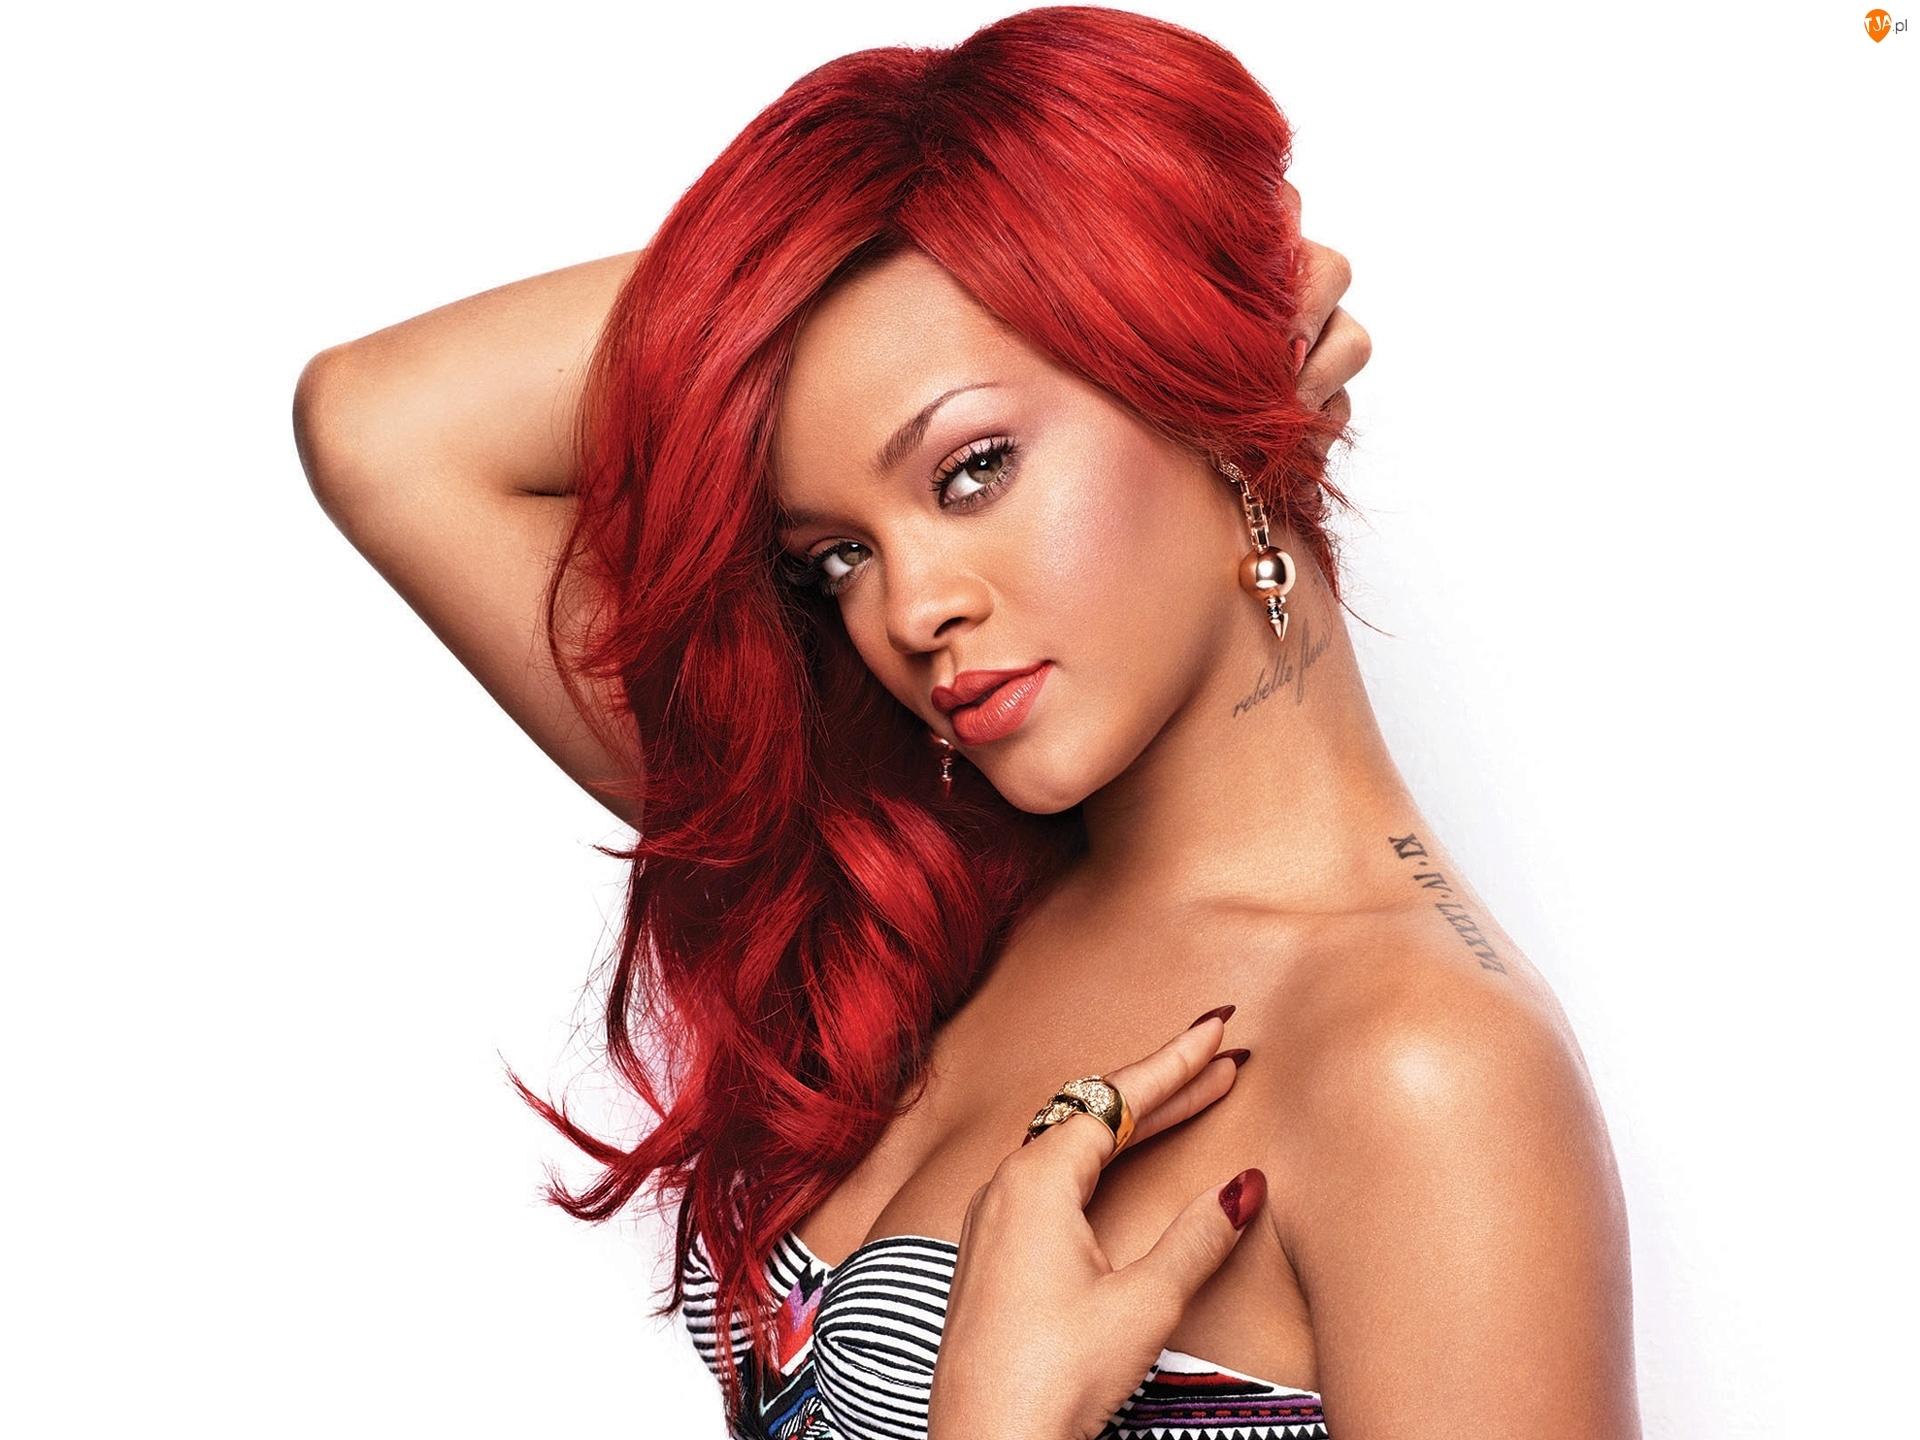 Biżuteria, Rihanna, Tatuaże